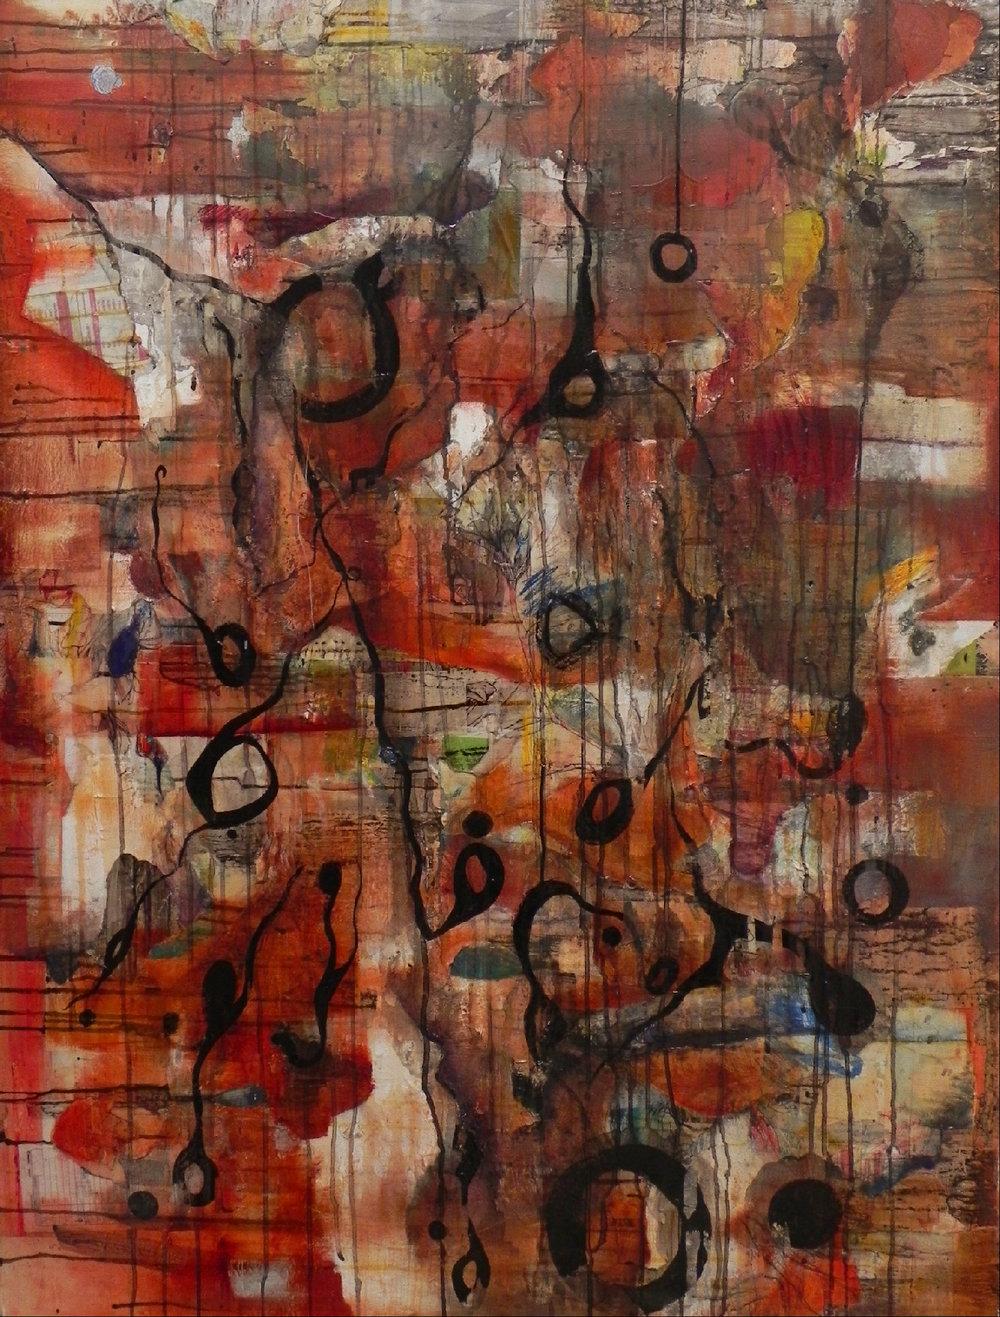 "TUMULTUOUS, 2008. 50"" x 38"". Canvas. Mixed Media. Copyright © Karen Santos 2013. SOLD."